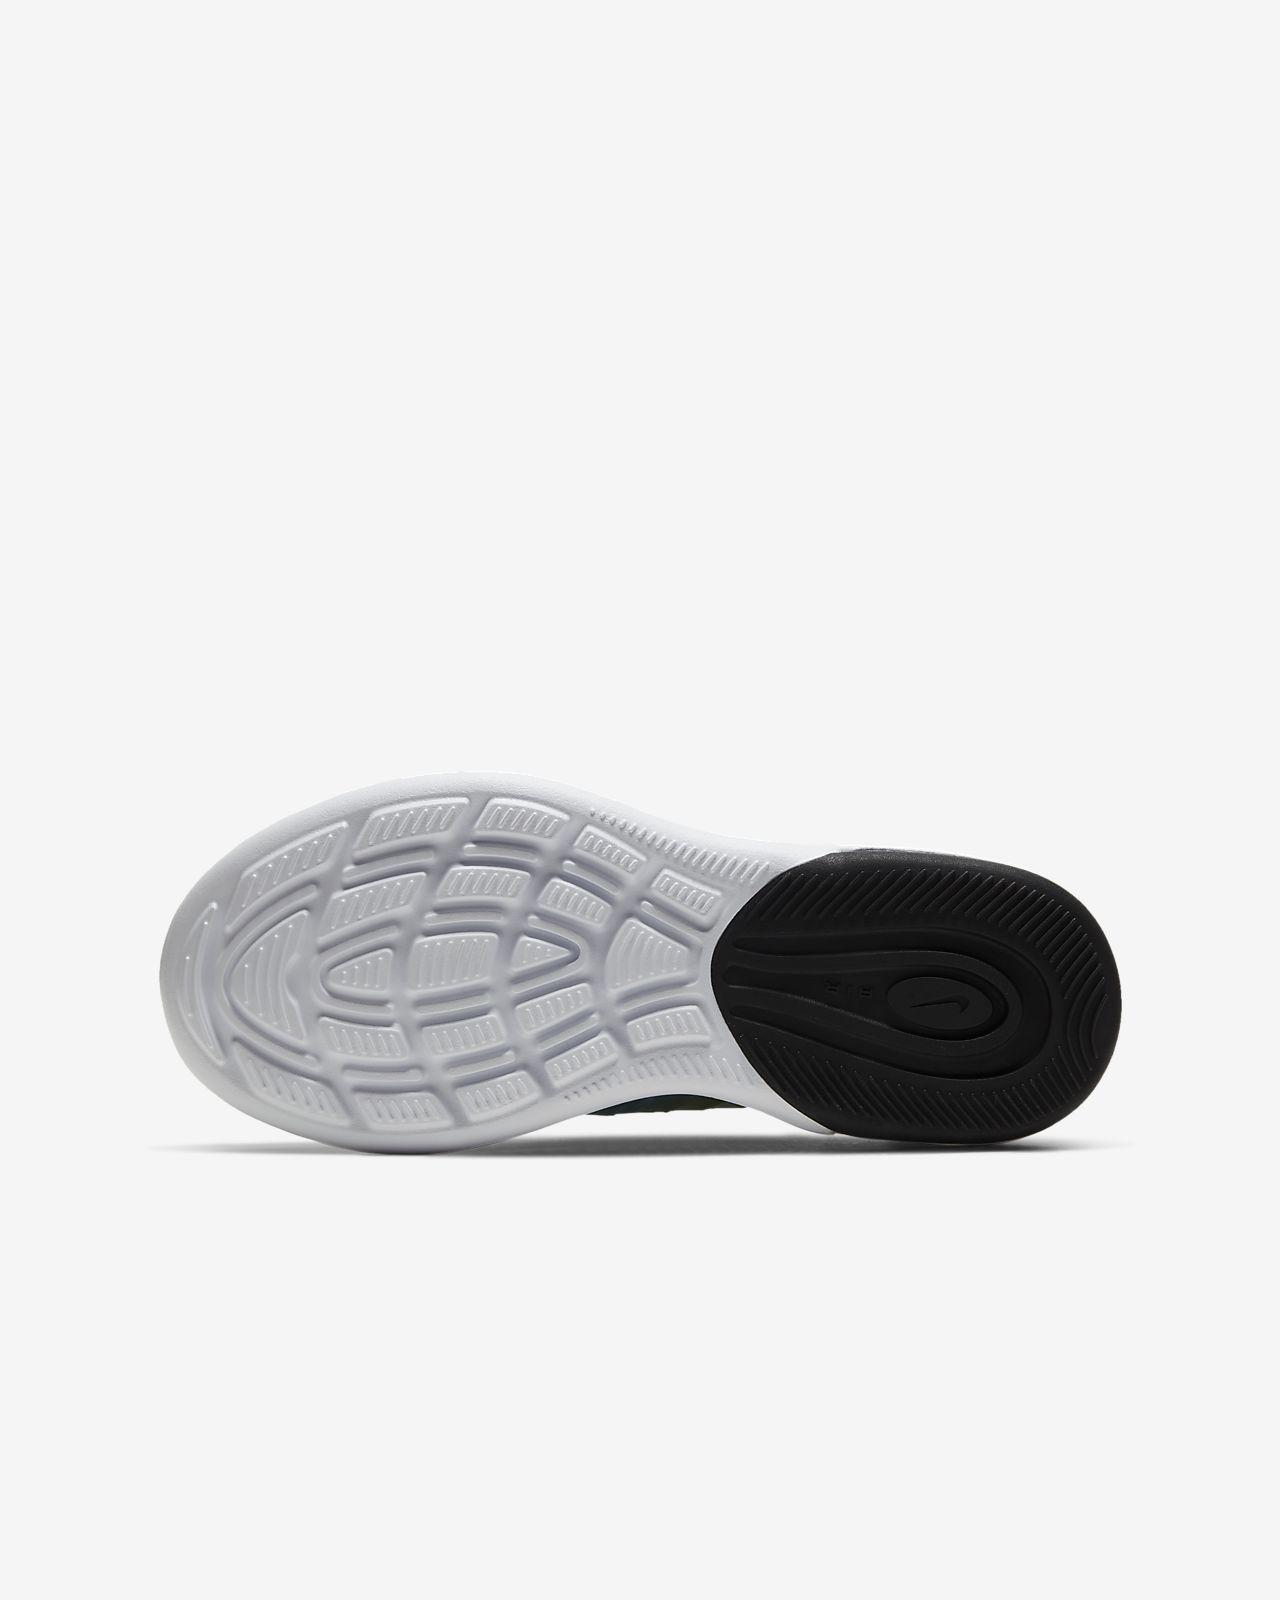 Nike Air Max Axis cipő gyerekeknek. Nike HU